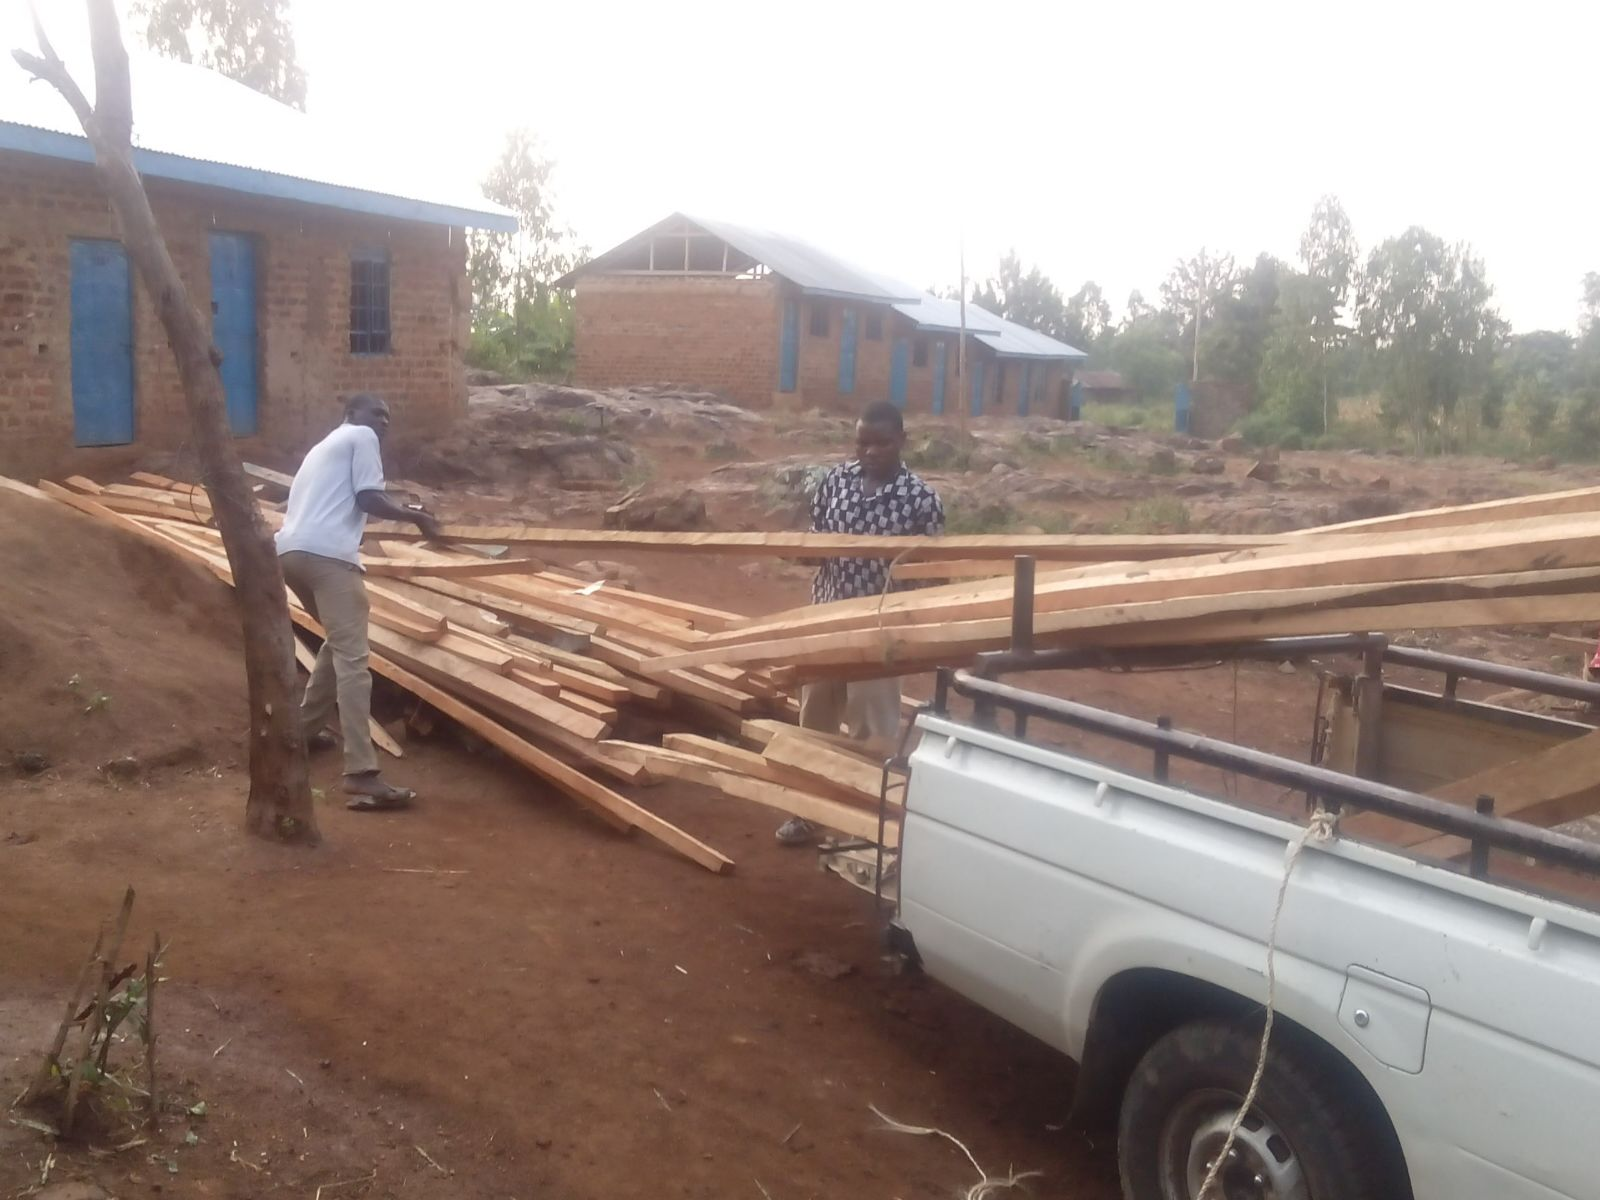 Unloading wood